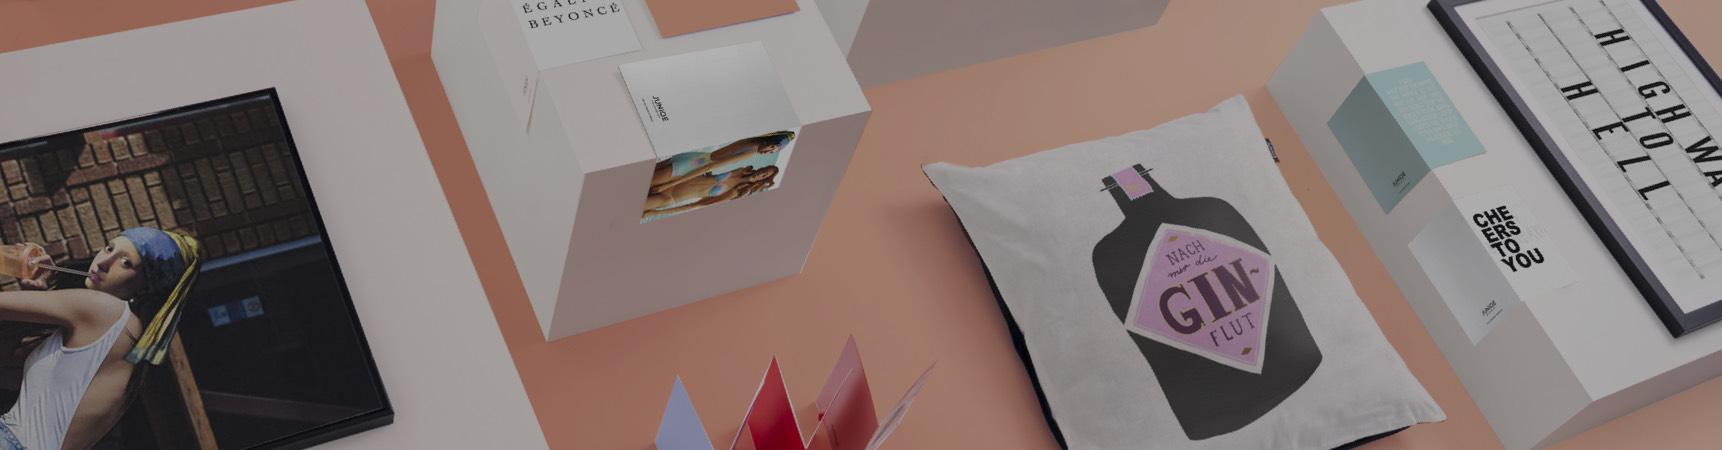 geschenke f r die beste freundin juniqe. Black Bedroom Furniture Sets. Home Design Ideas